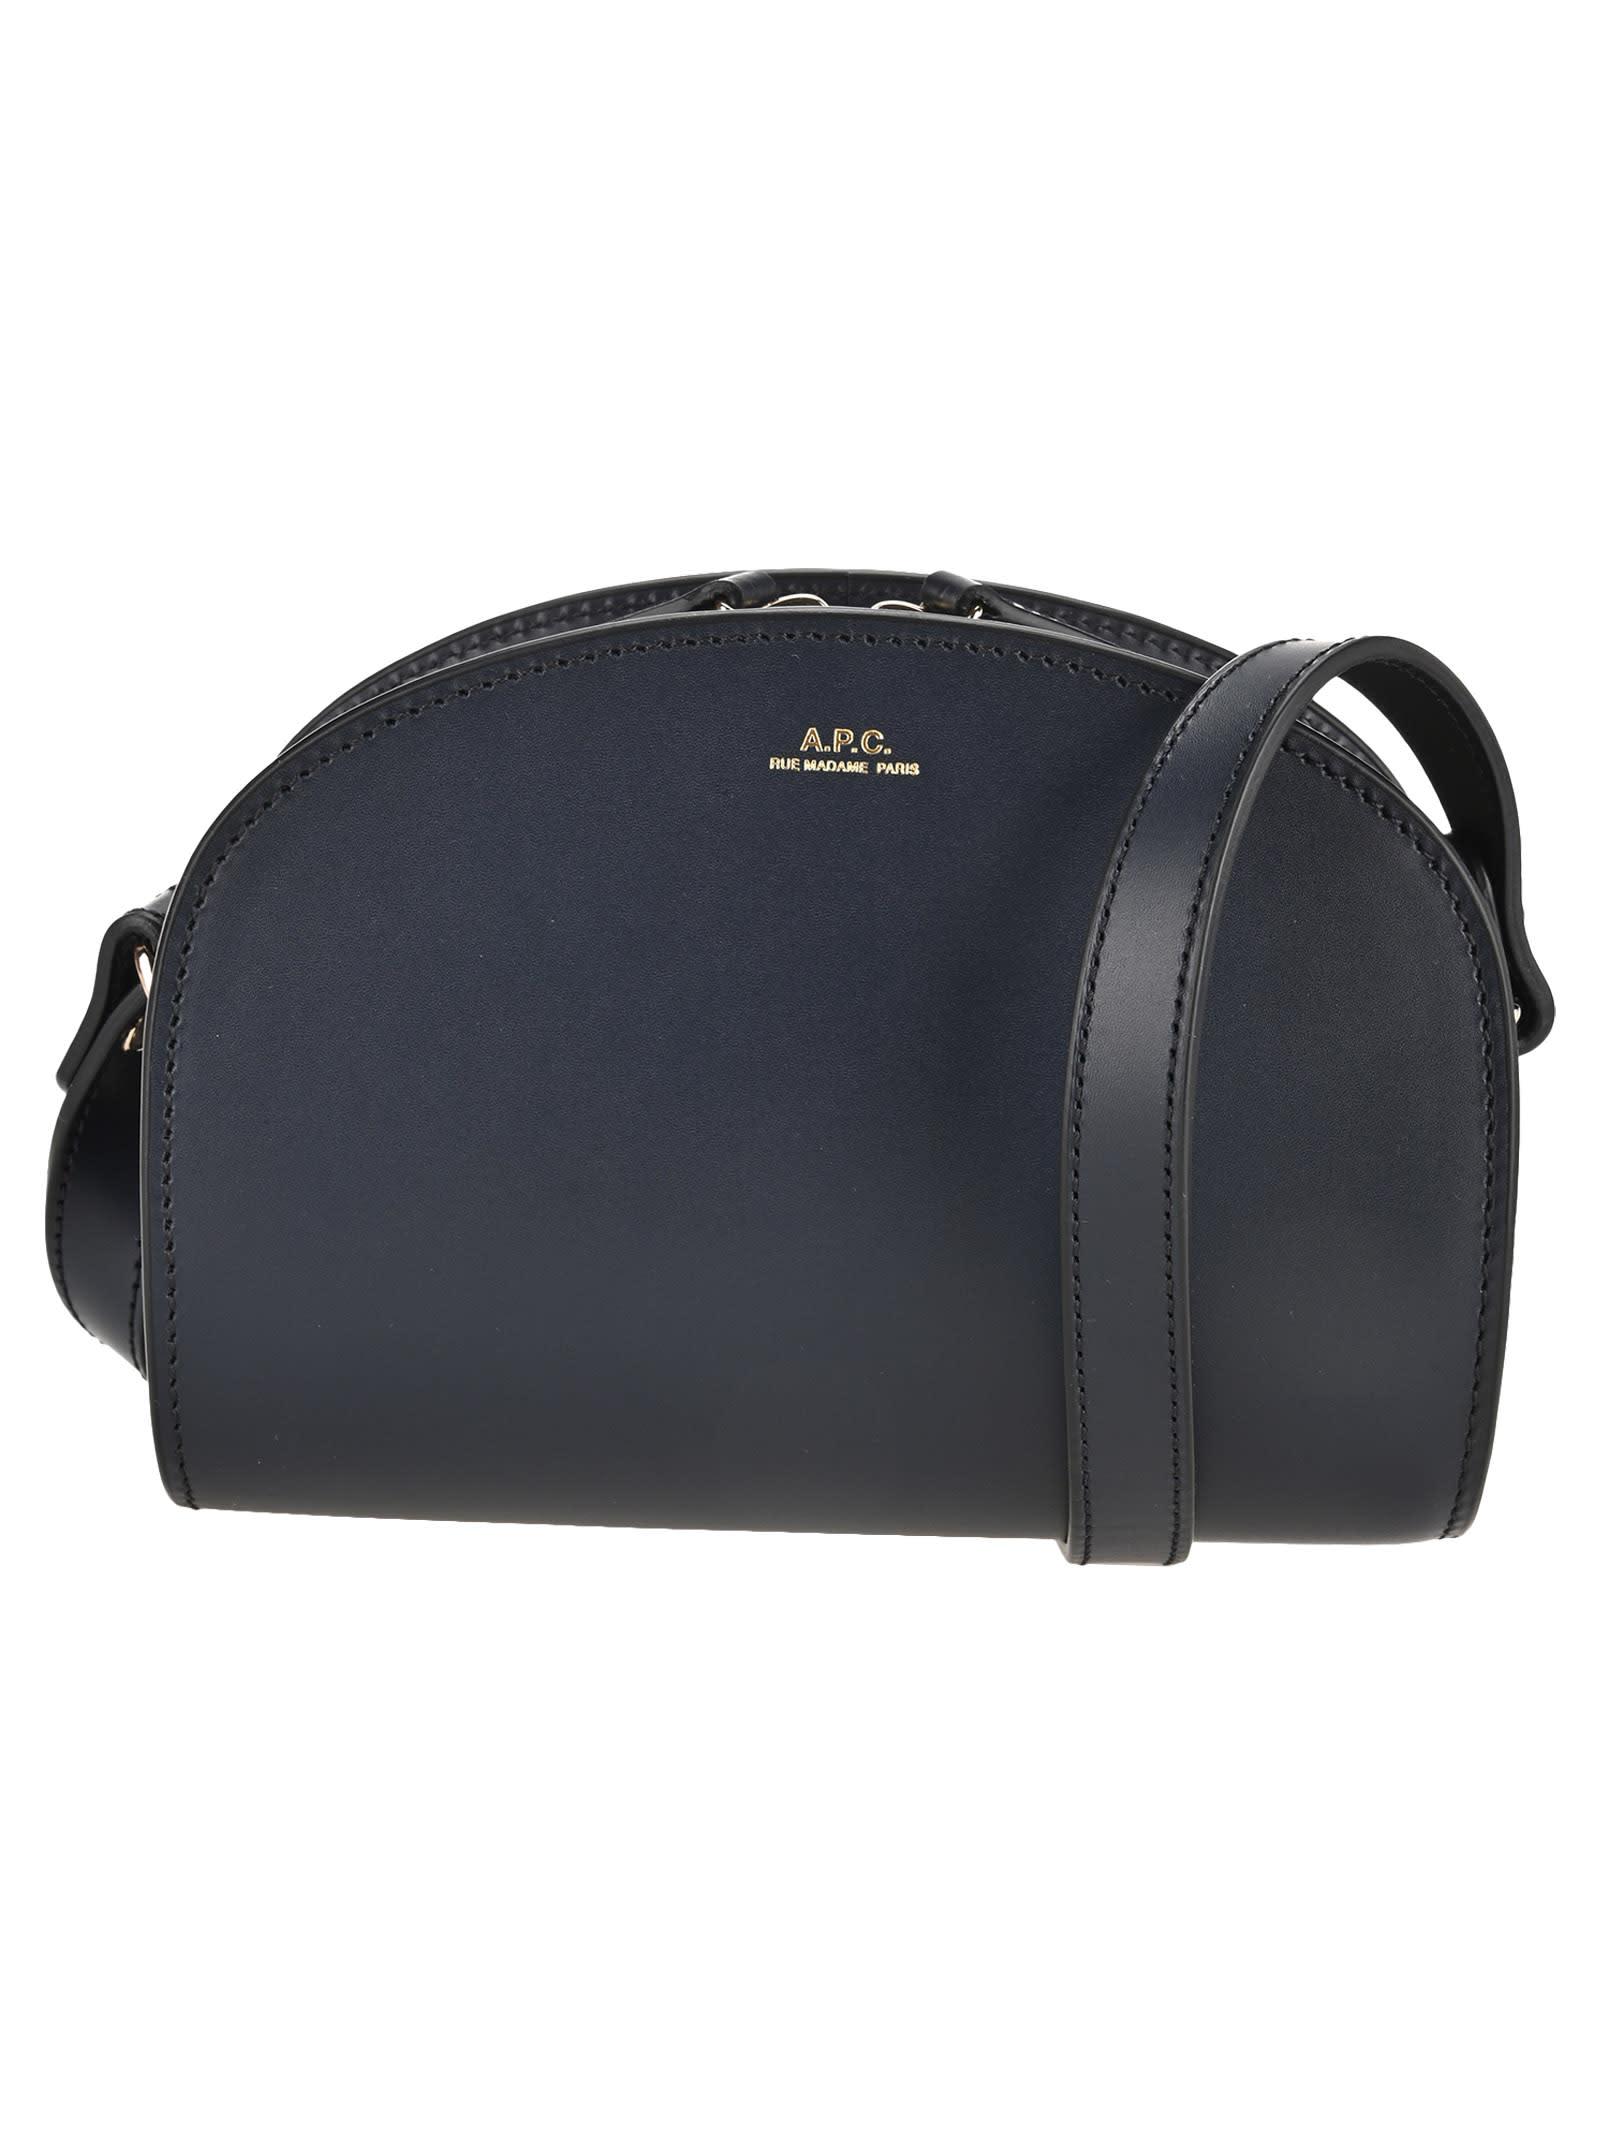 A.p.c. Leathers A.P.C. MINI DEMI-LUNE BAG